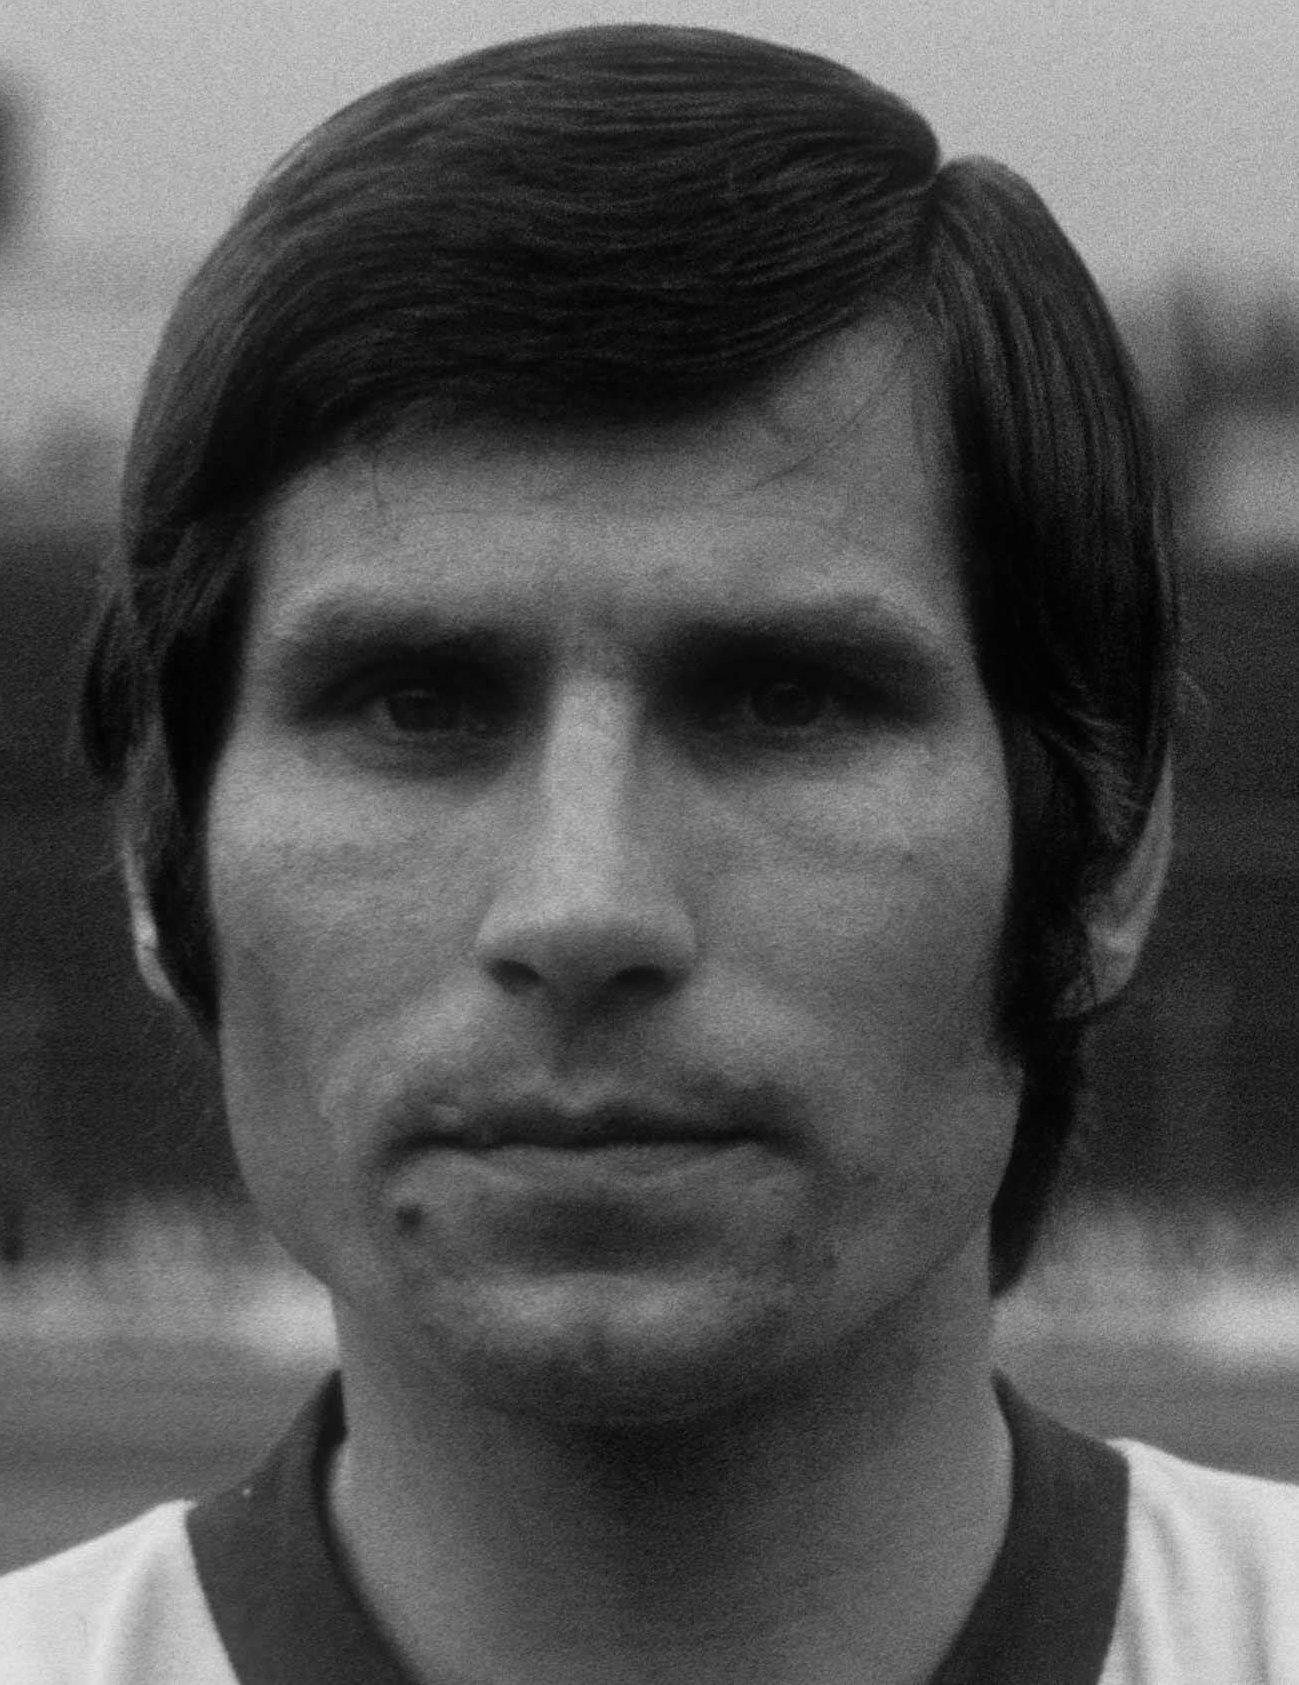 Klaus Gerwien